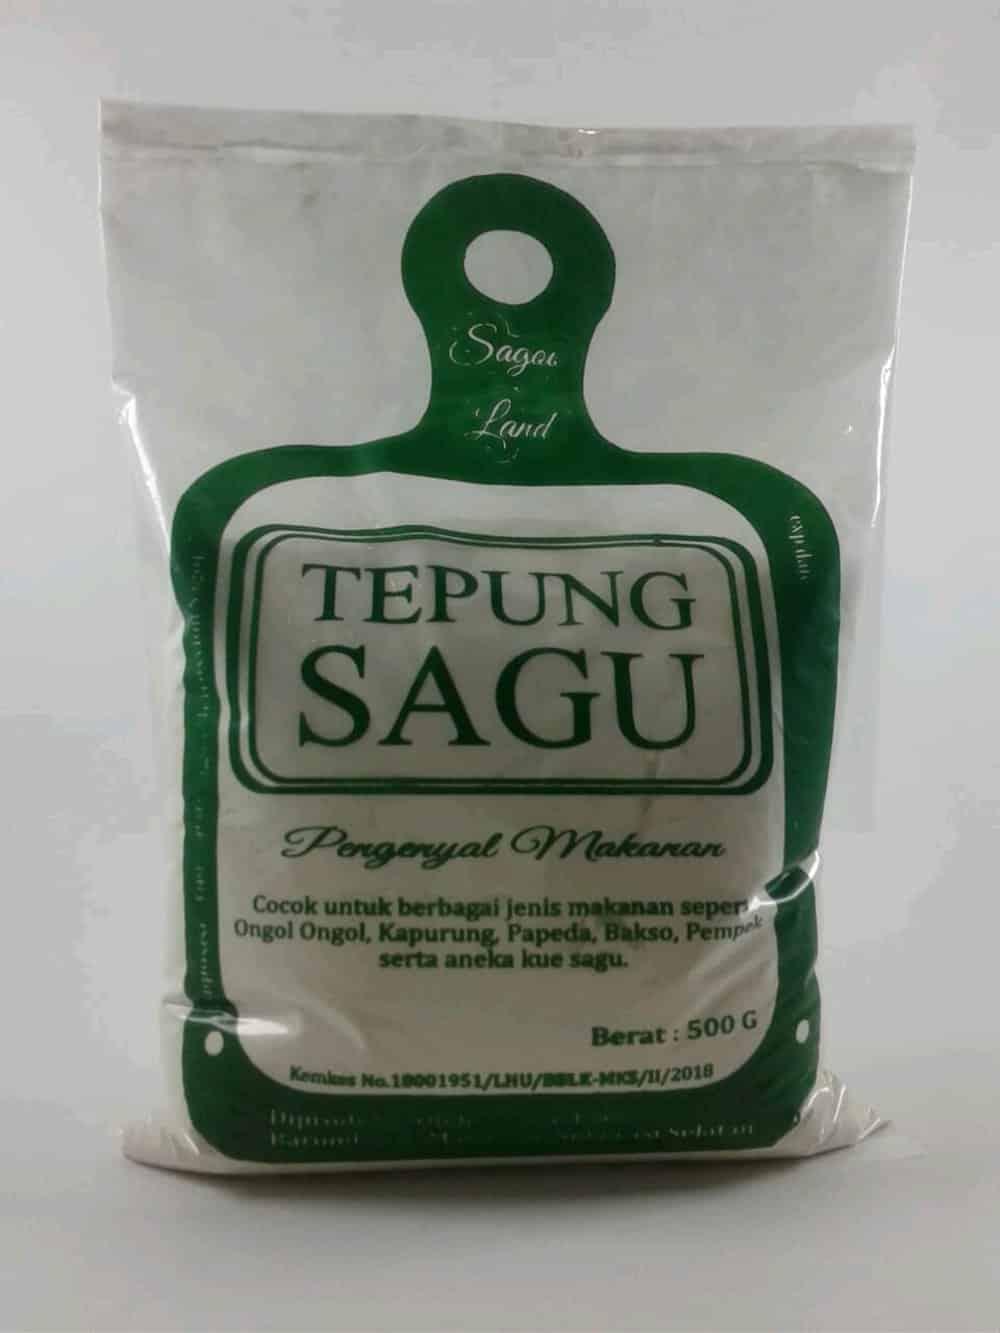 2. Sagoo Land Tepung Sagu